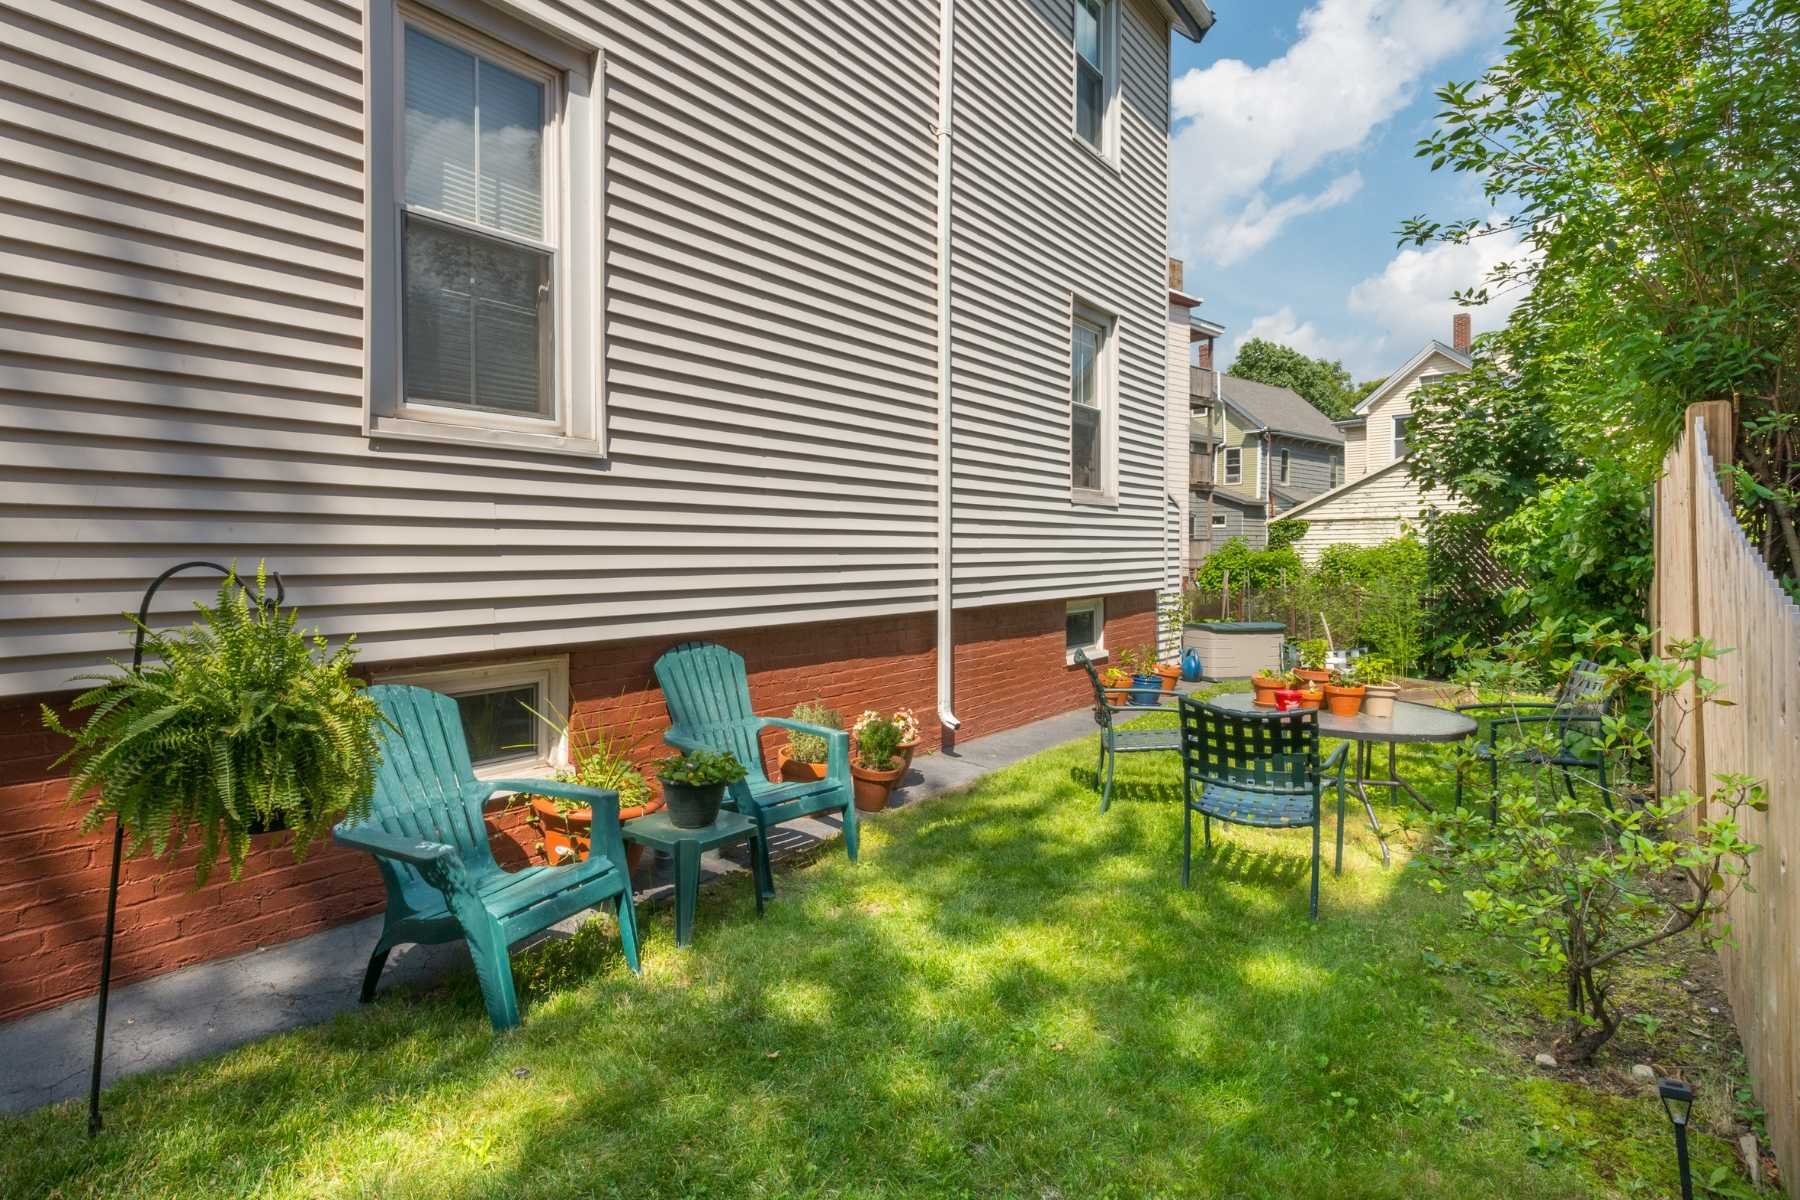 3-CapstoneCommunities-property-Dickinson-Street-Apartments-Somerville.jpg